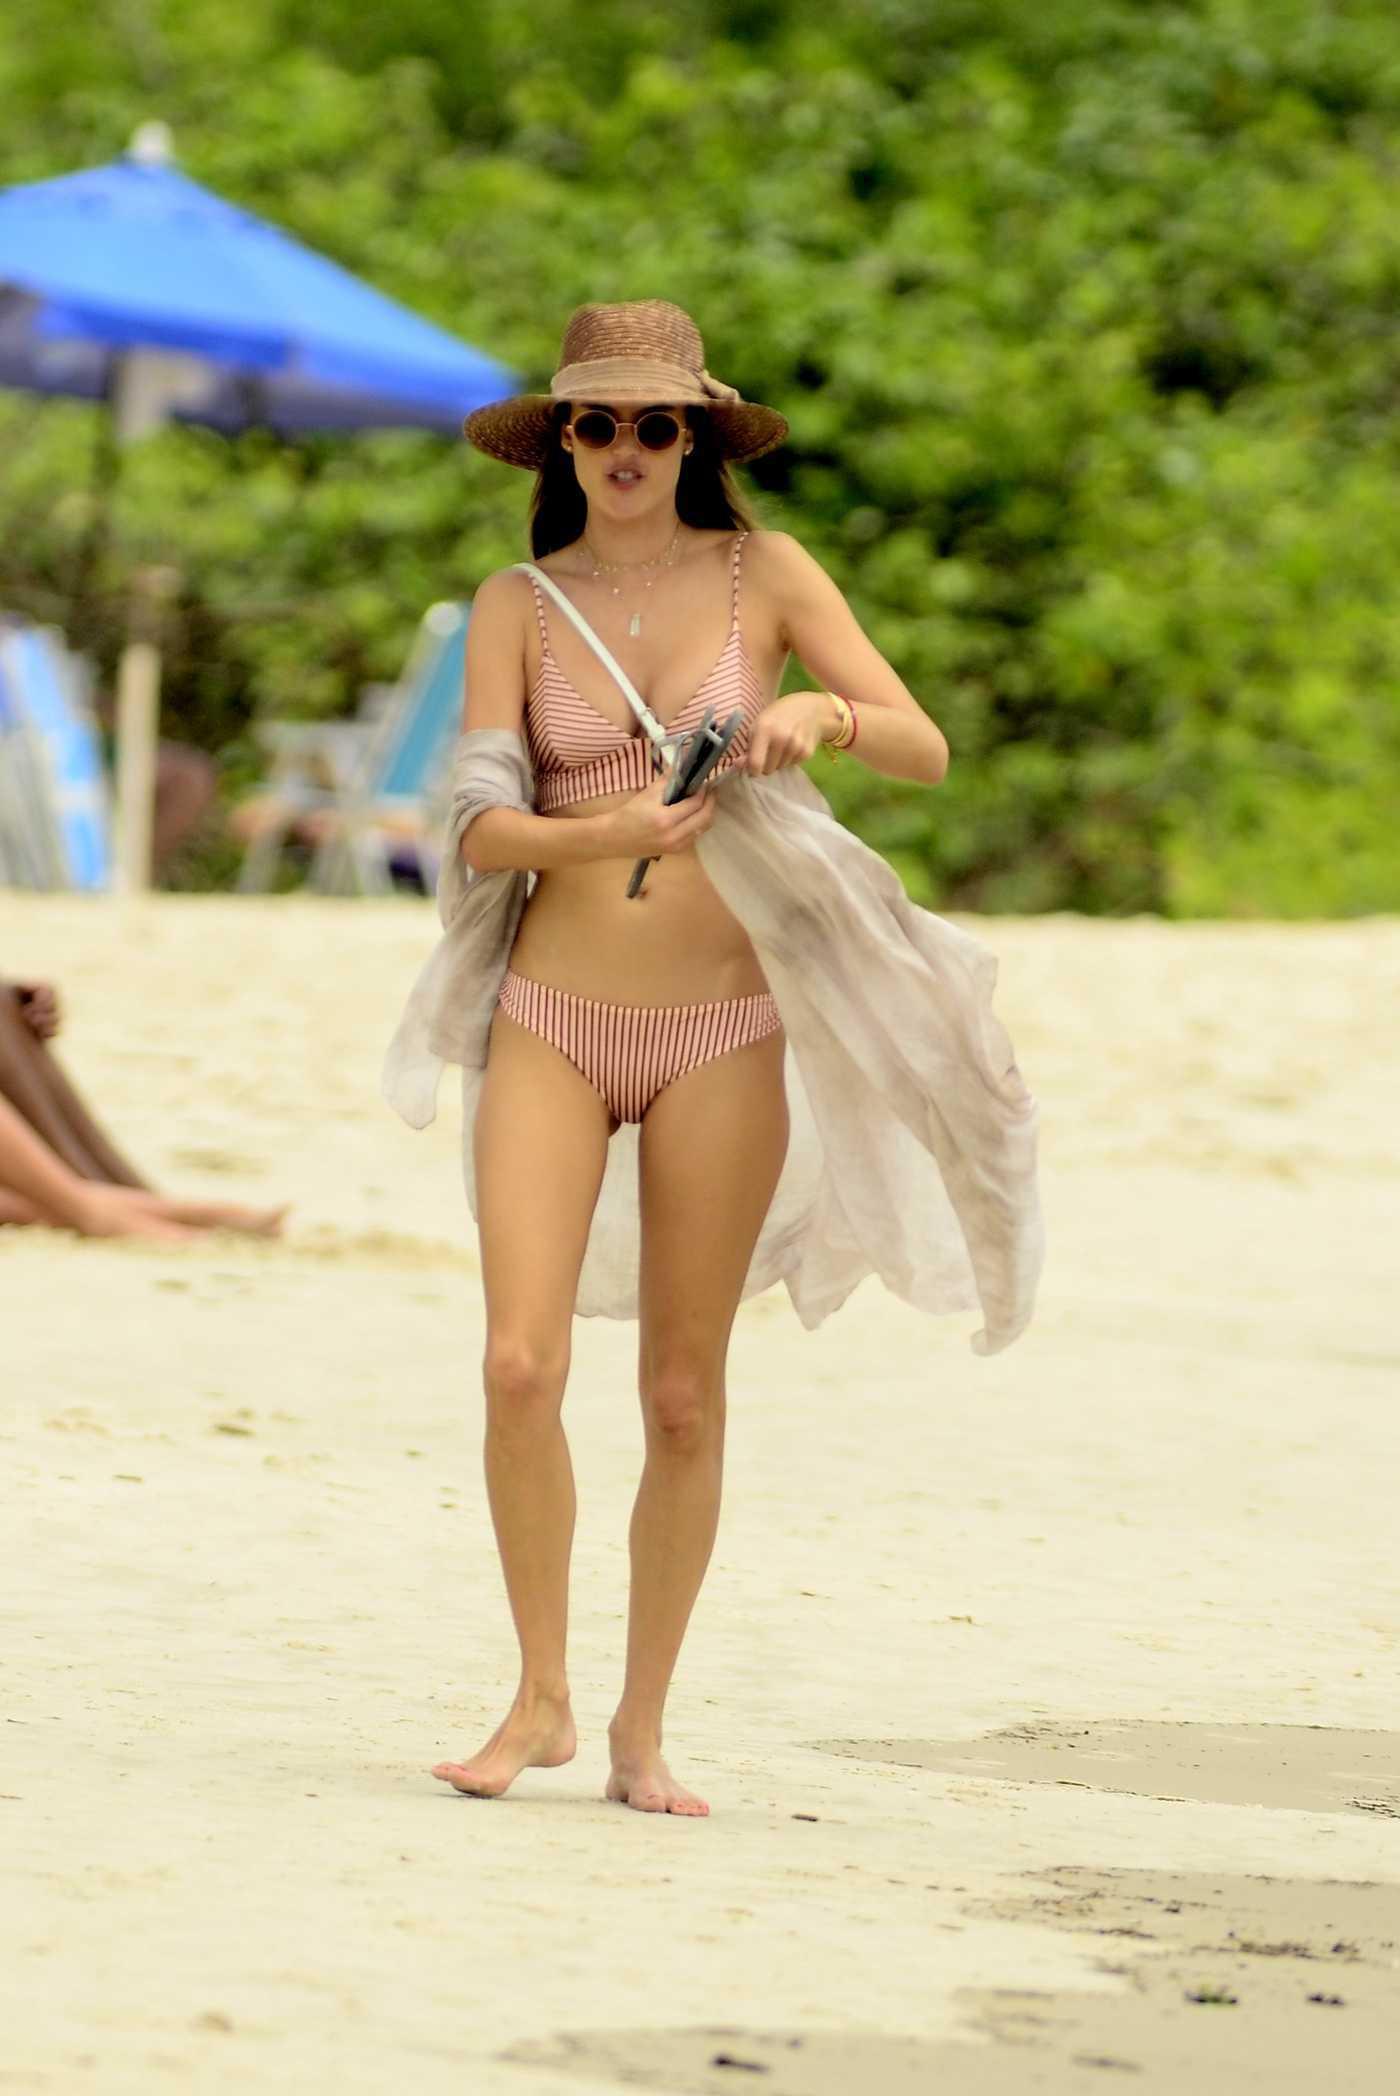 Alessandra Ambrosio in a Beige Striped Bikini on the Beach in Florianopolis, Brazil 12/23/2018